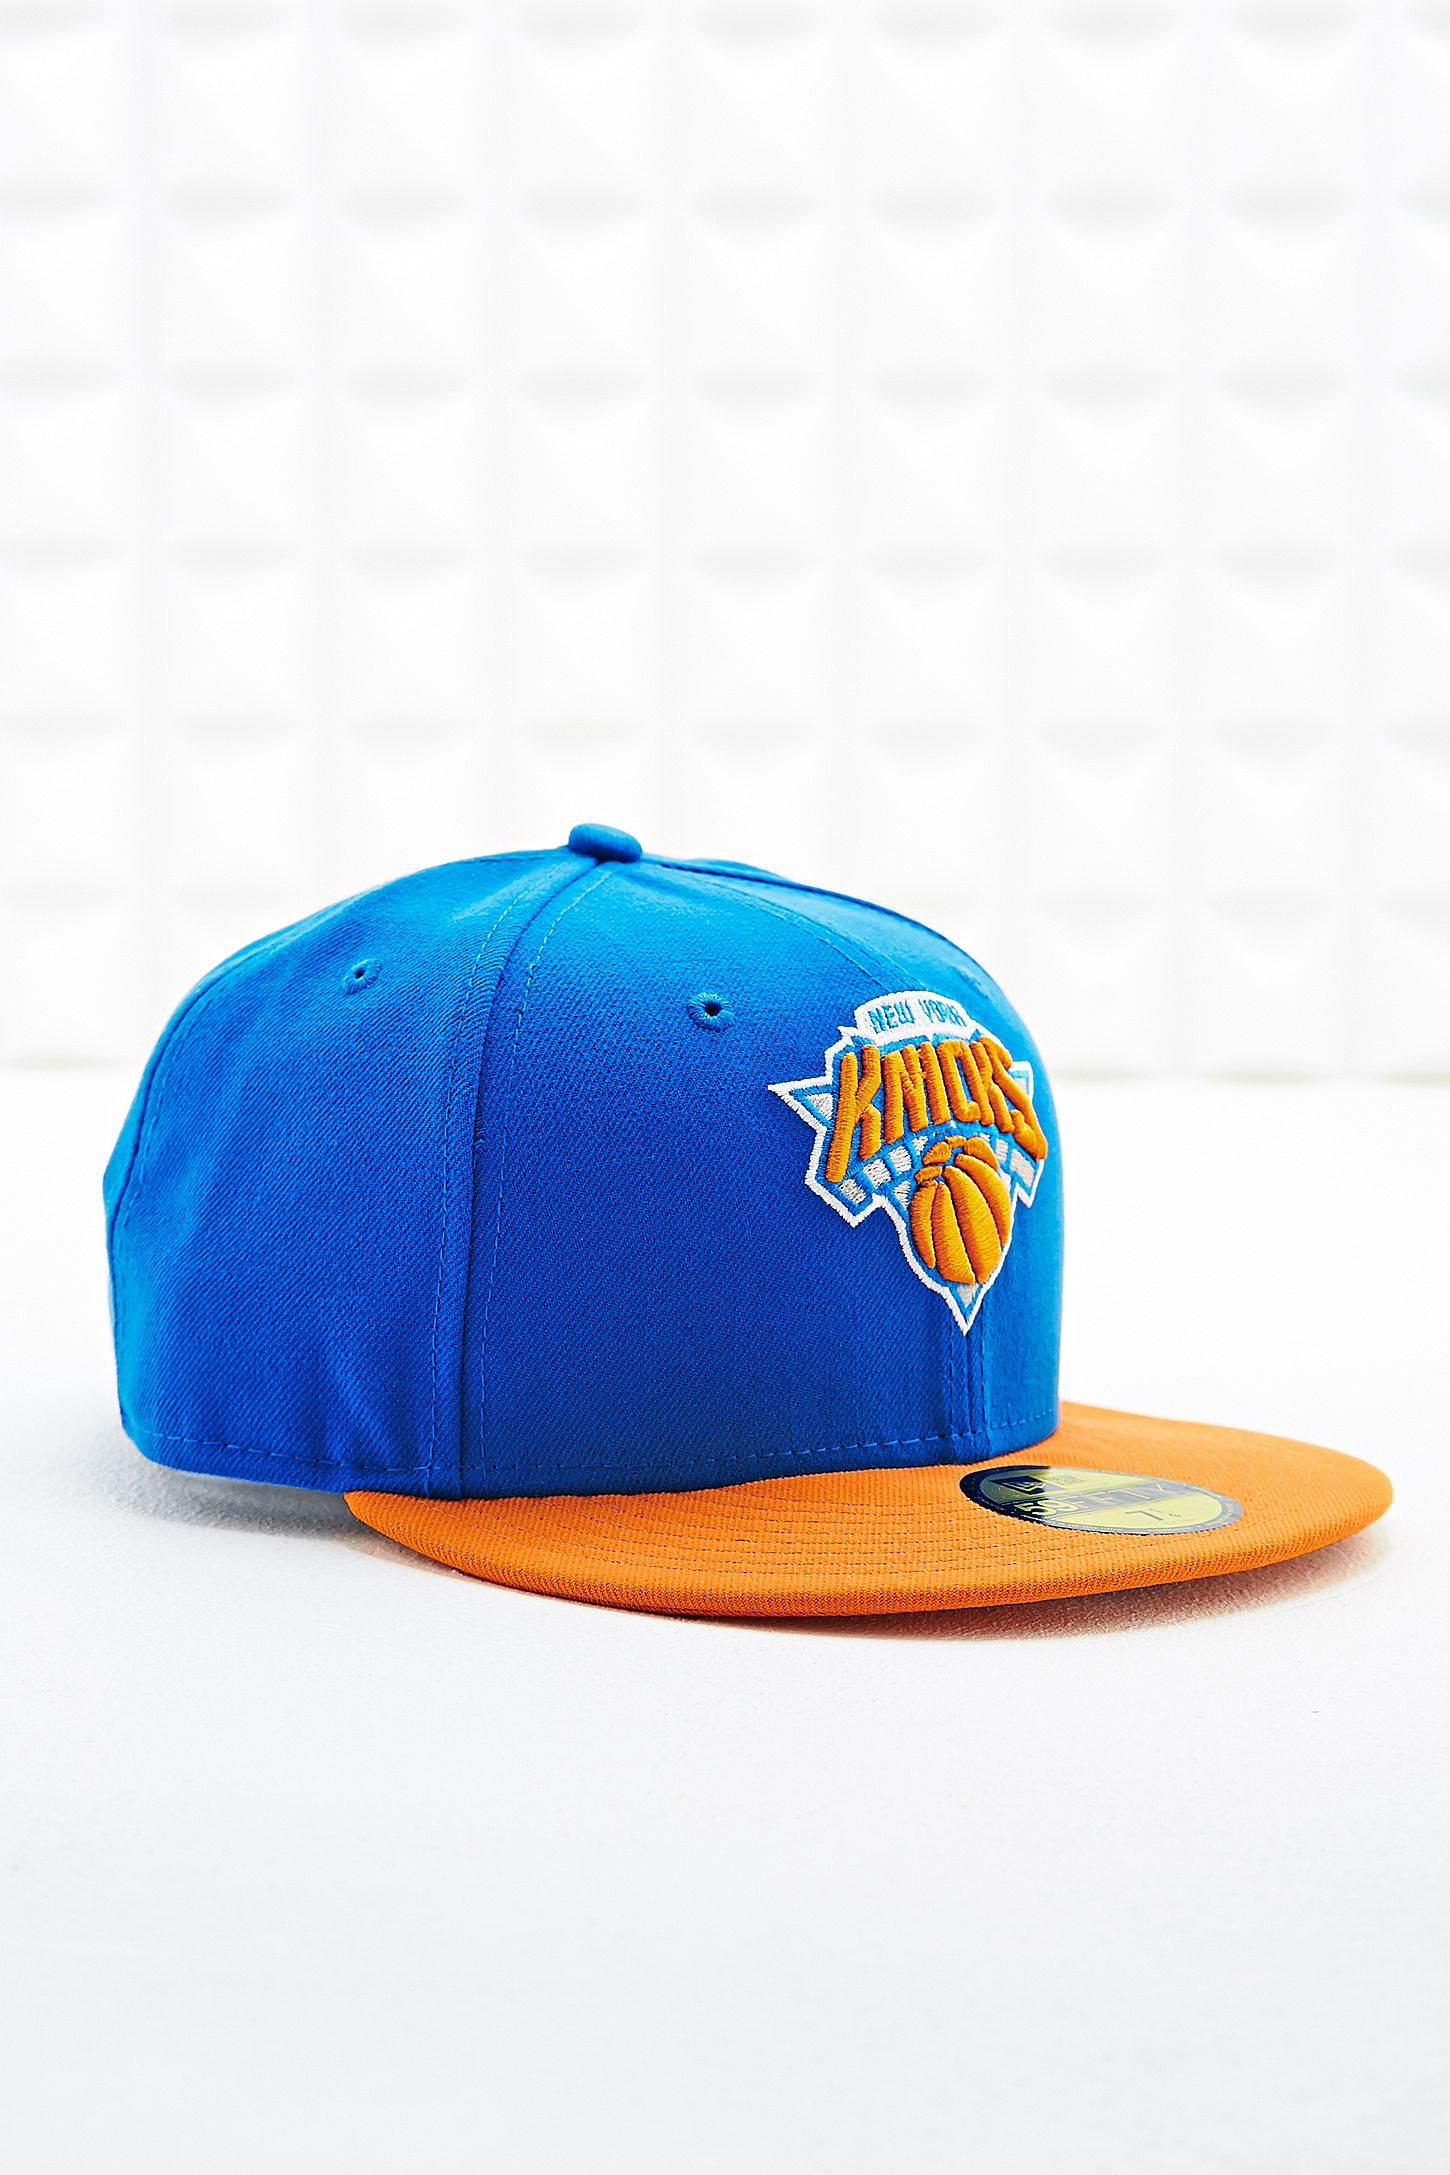 1b0e700a6abd New Era 9Fifty New York Knicks Cap in Blue